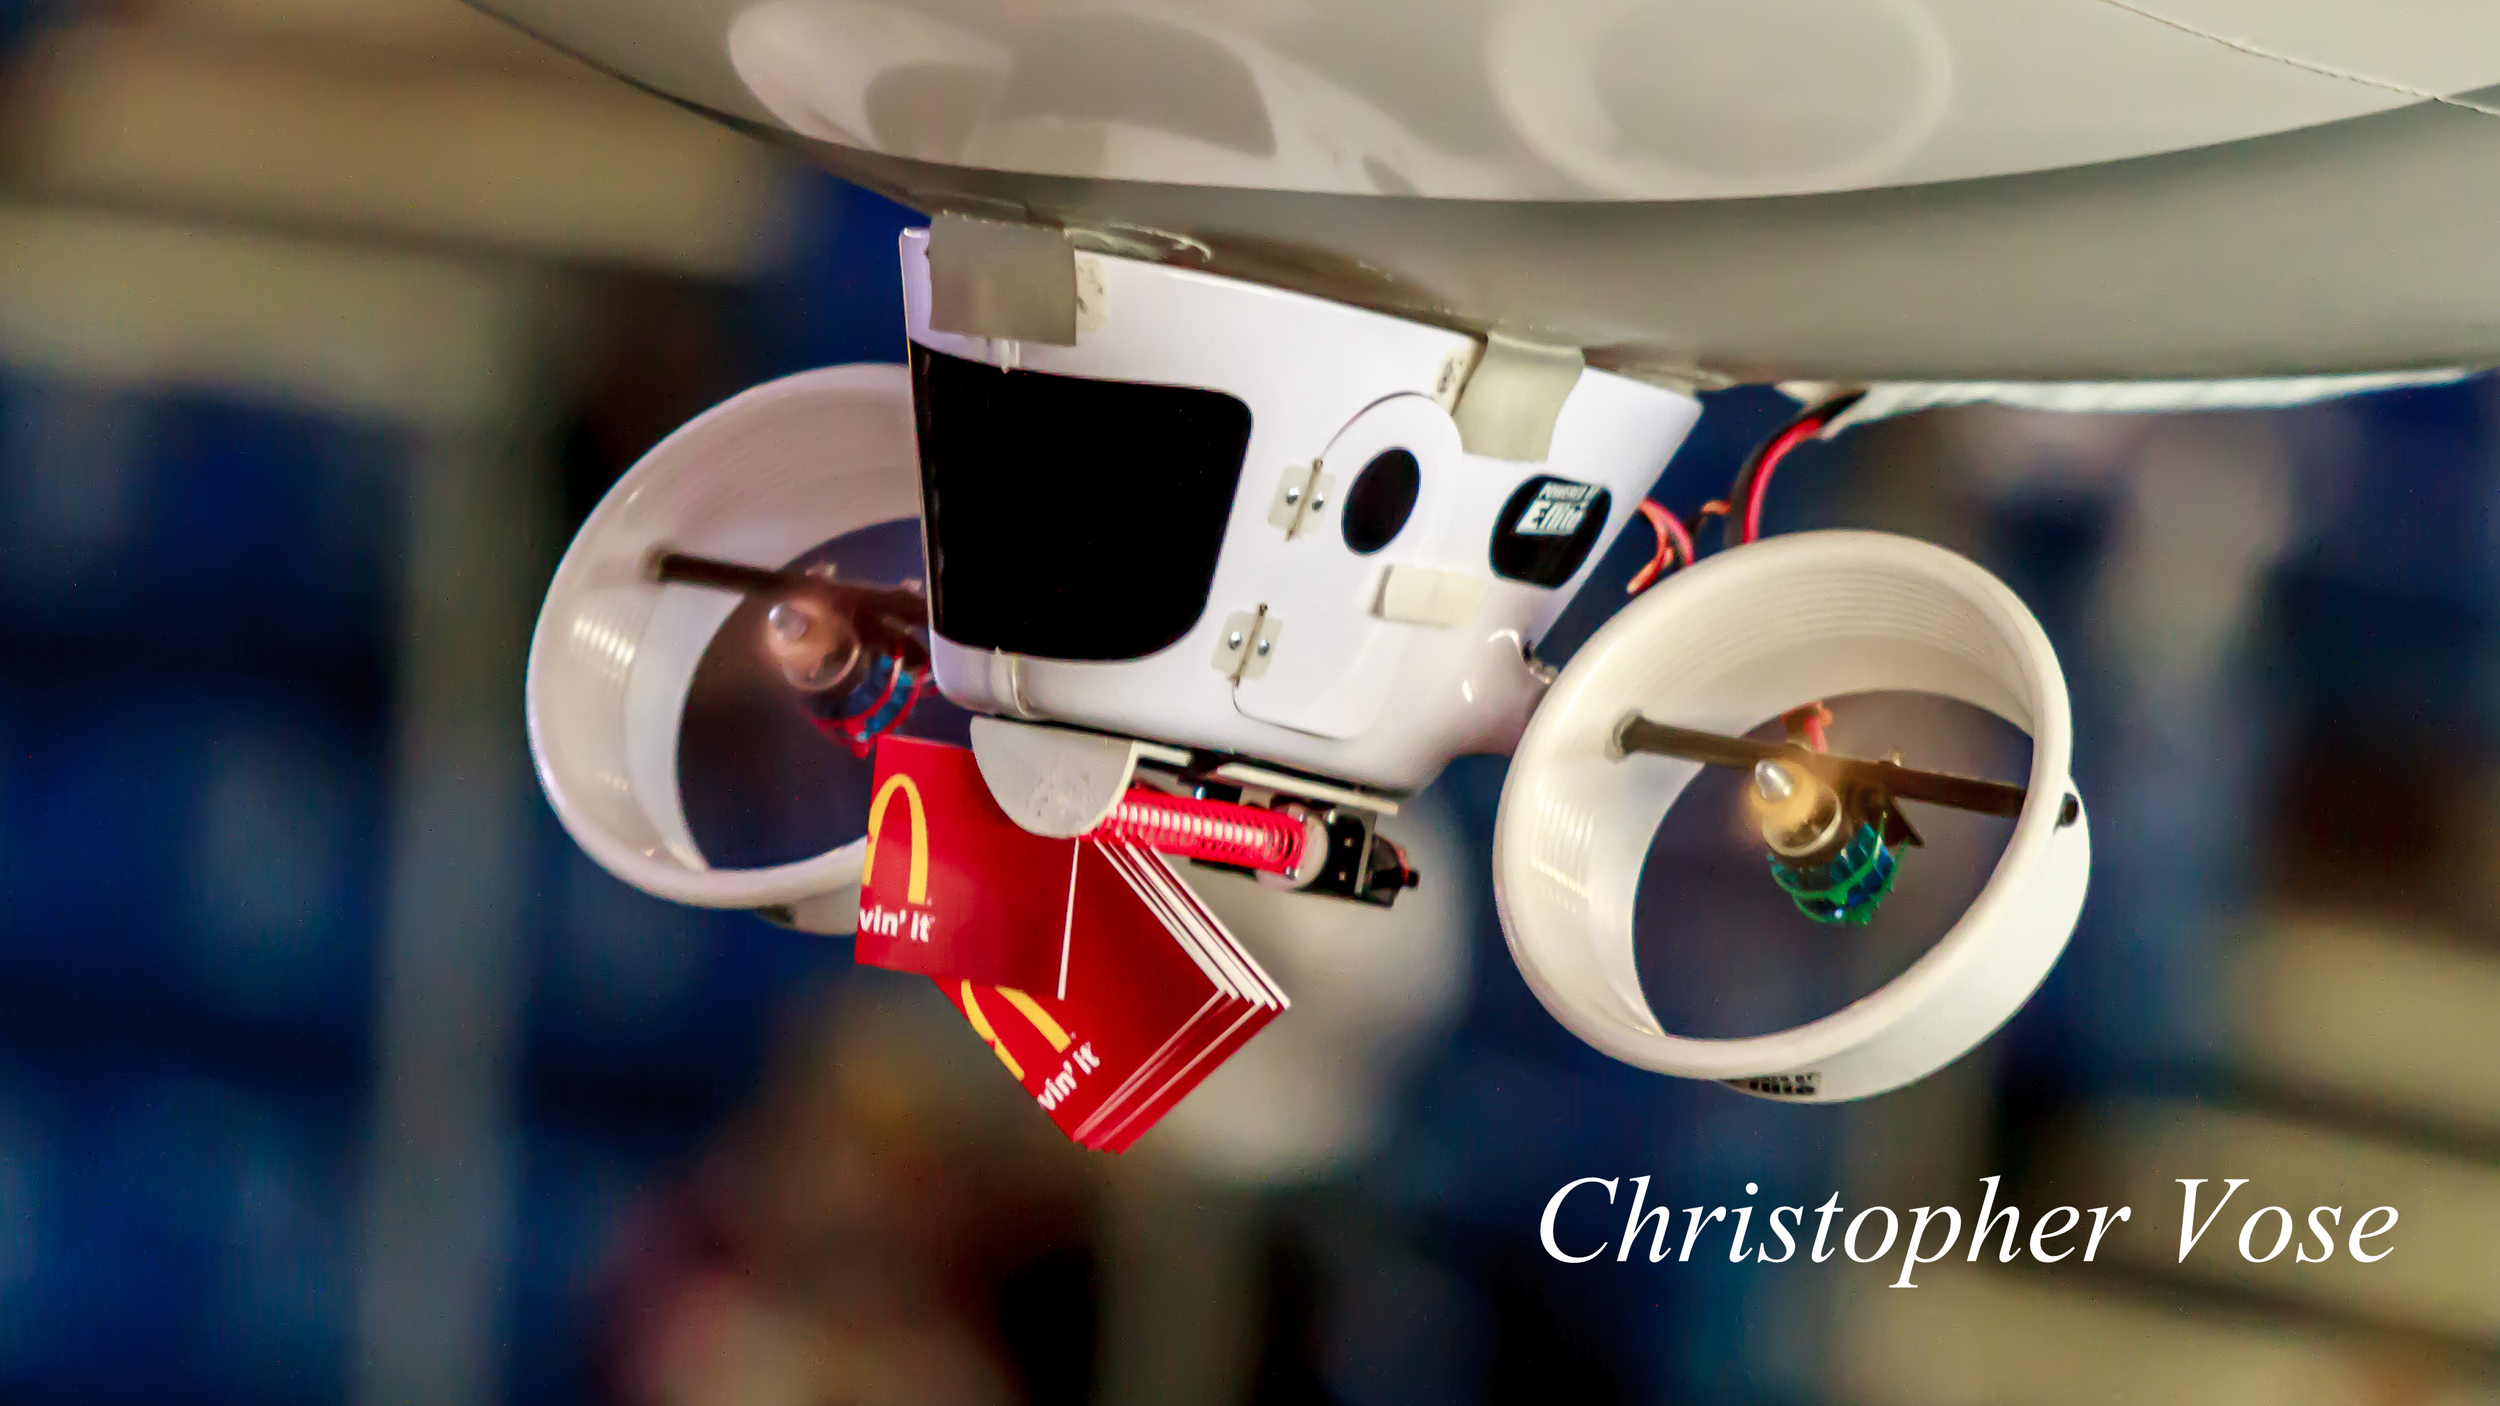 2014-01-17 RC Airship with McDonald's Coupons.jpg